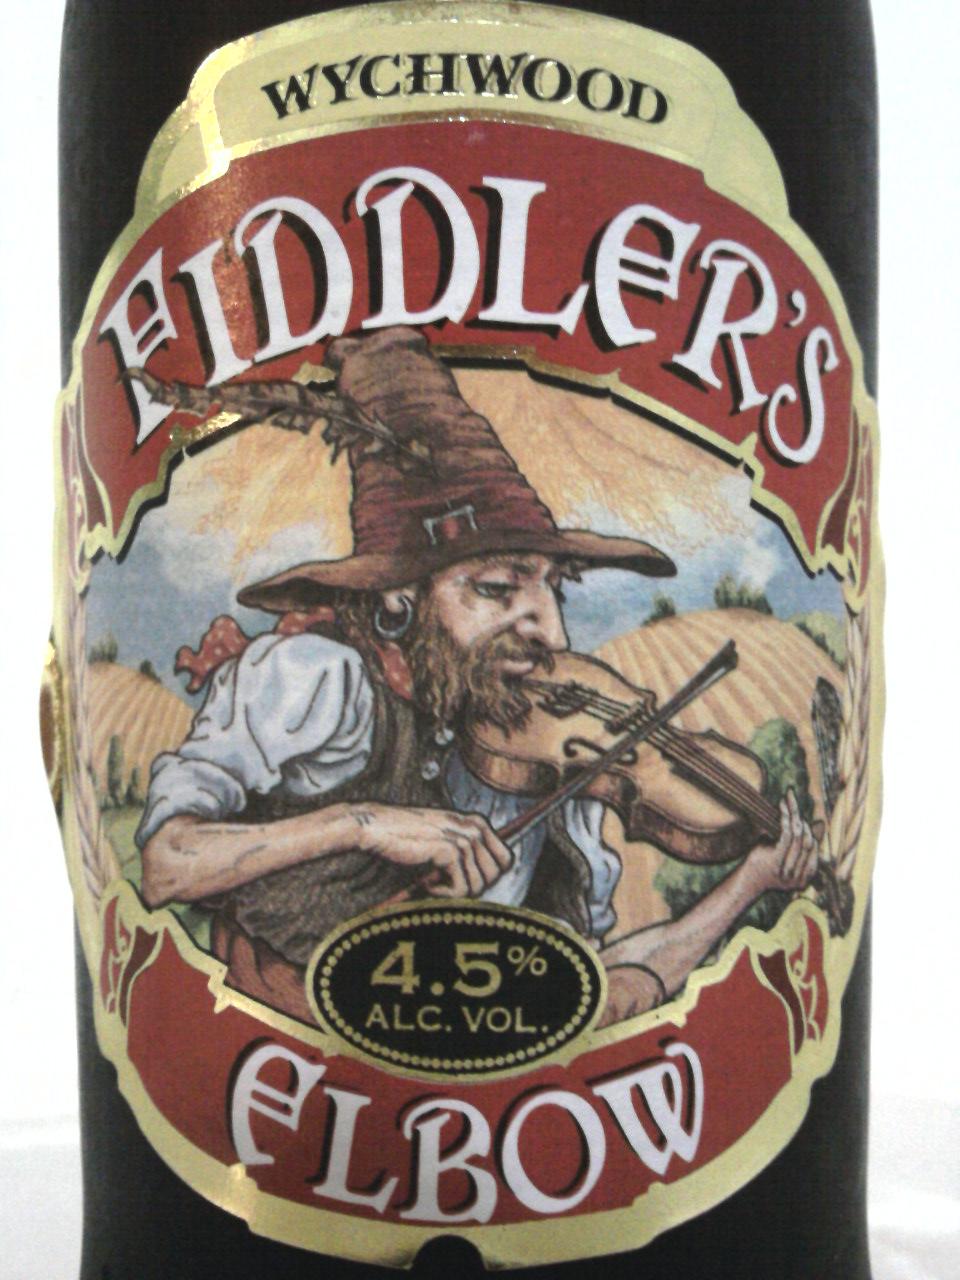 Wychwood Fiddler's Elbow front label